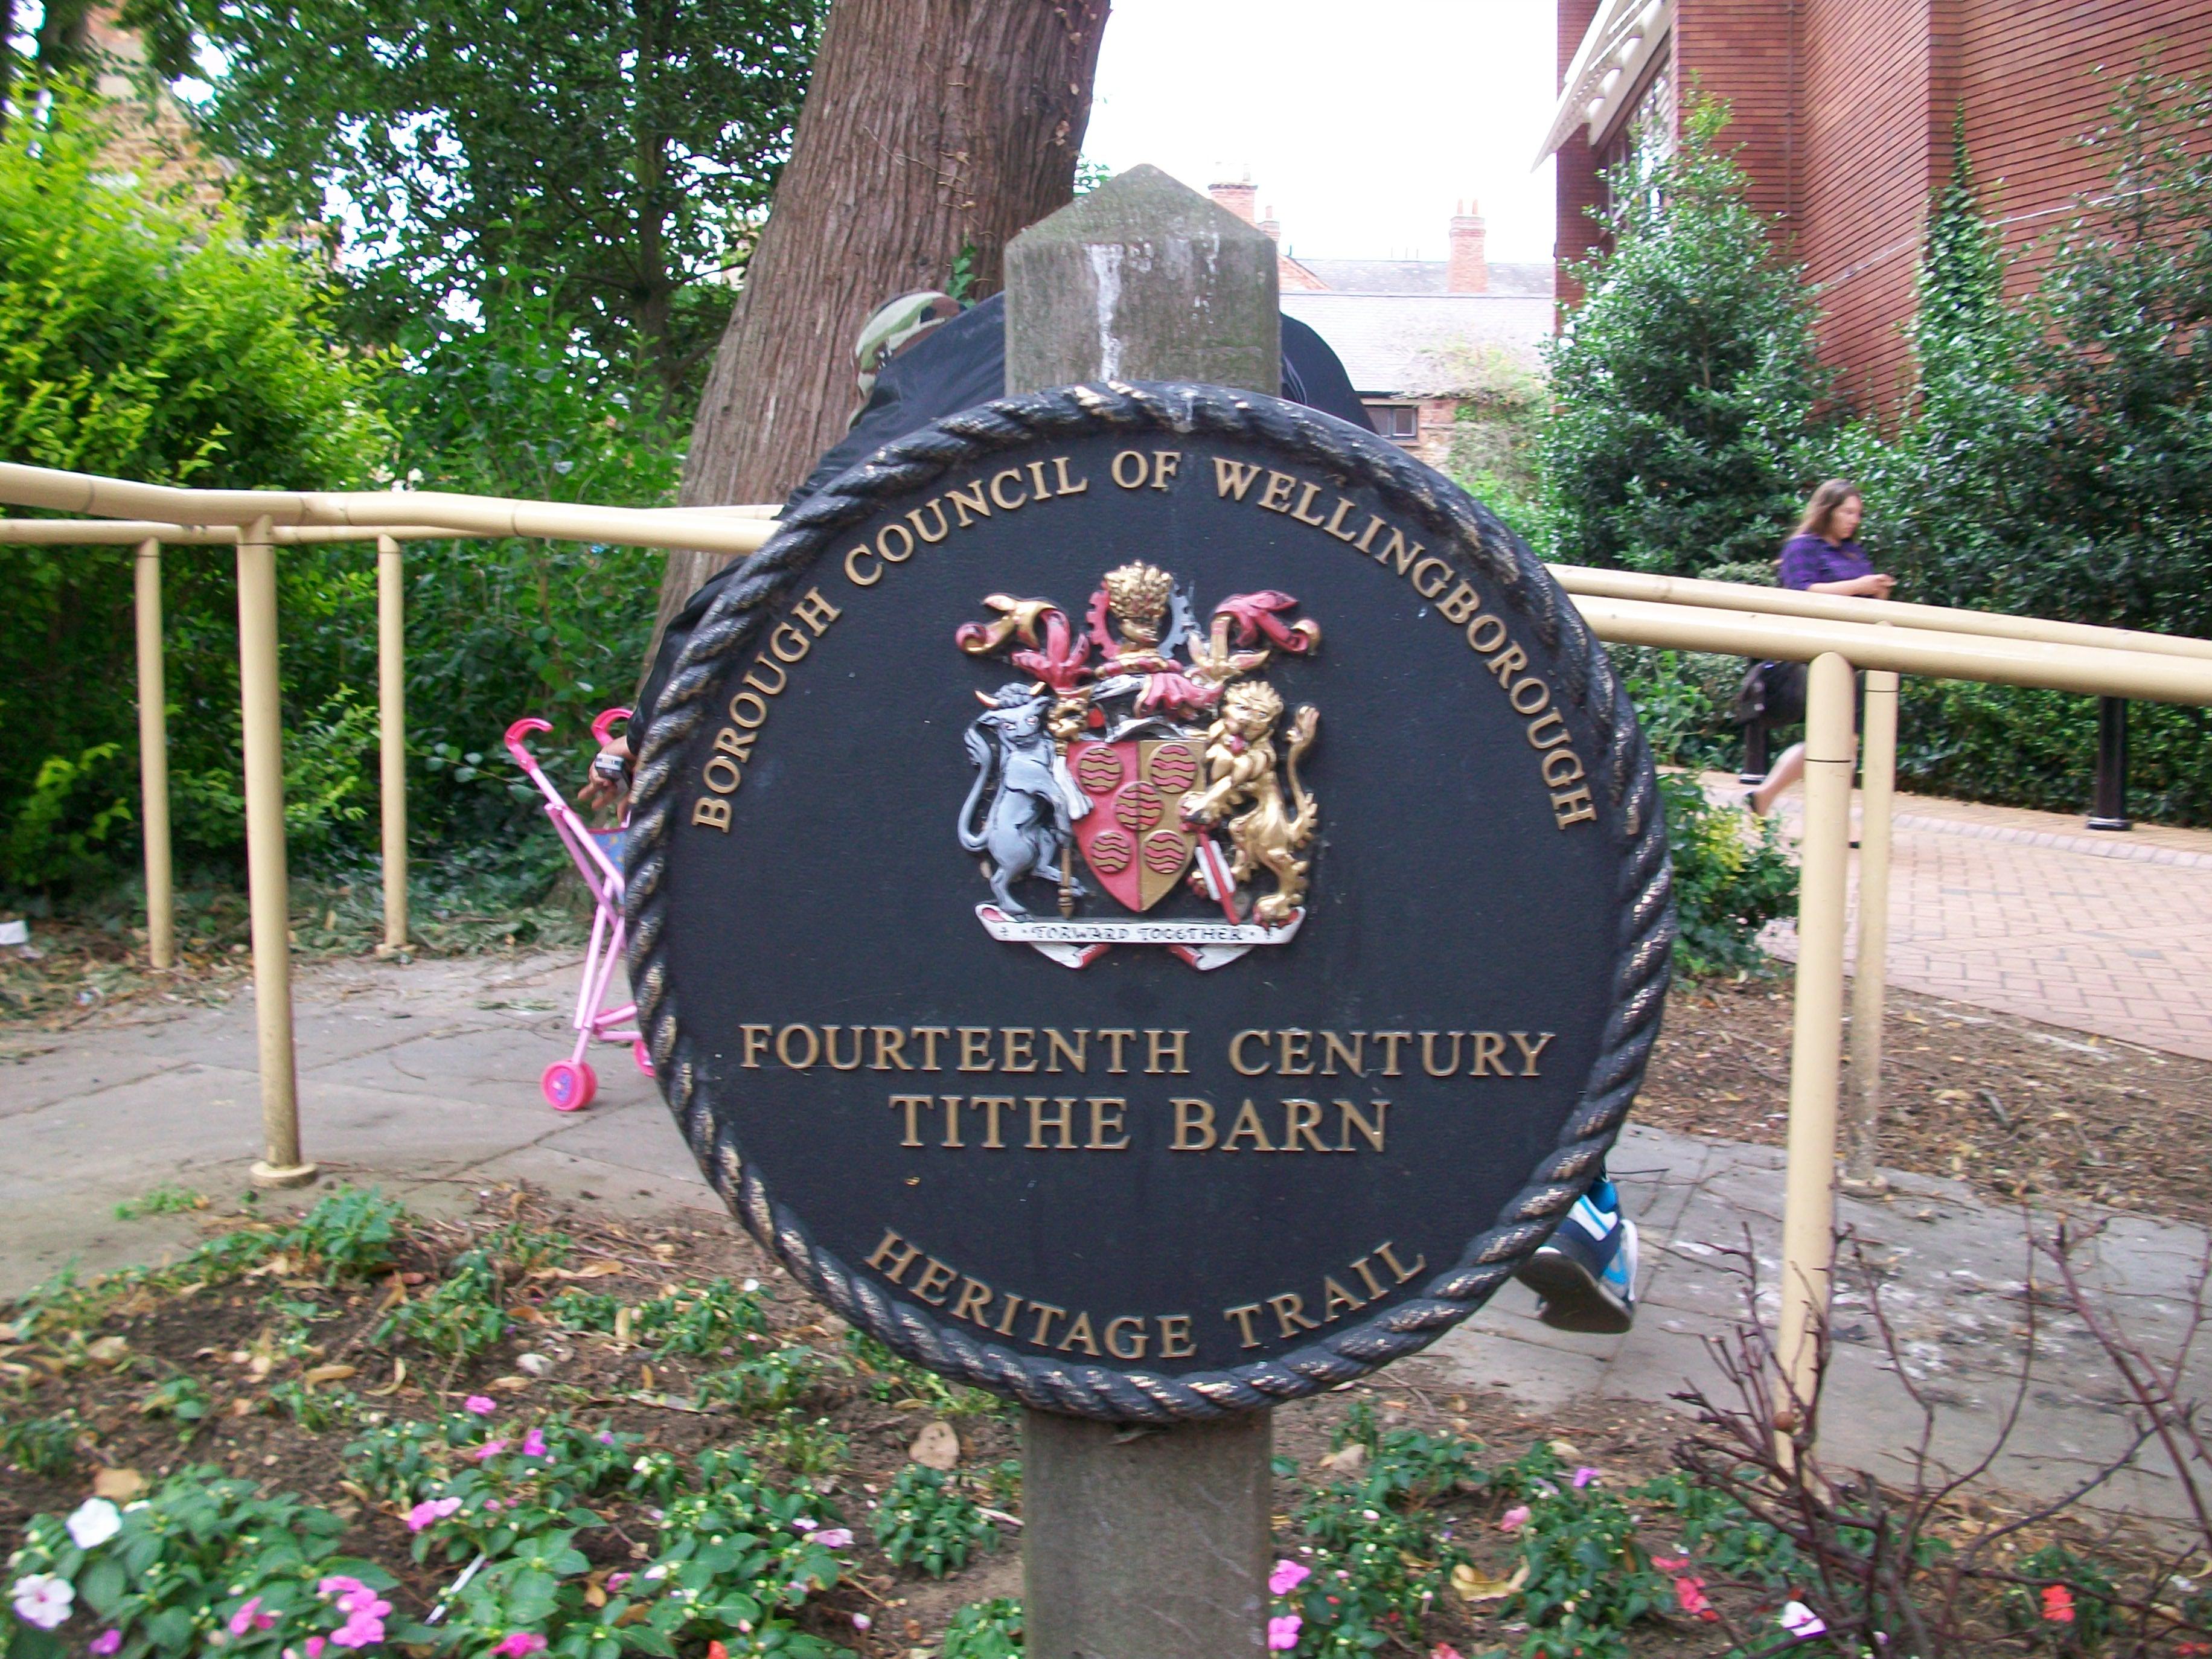 Tithe Barn Wellingborough Craft Fair